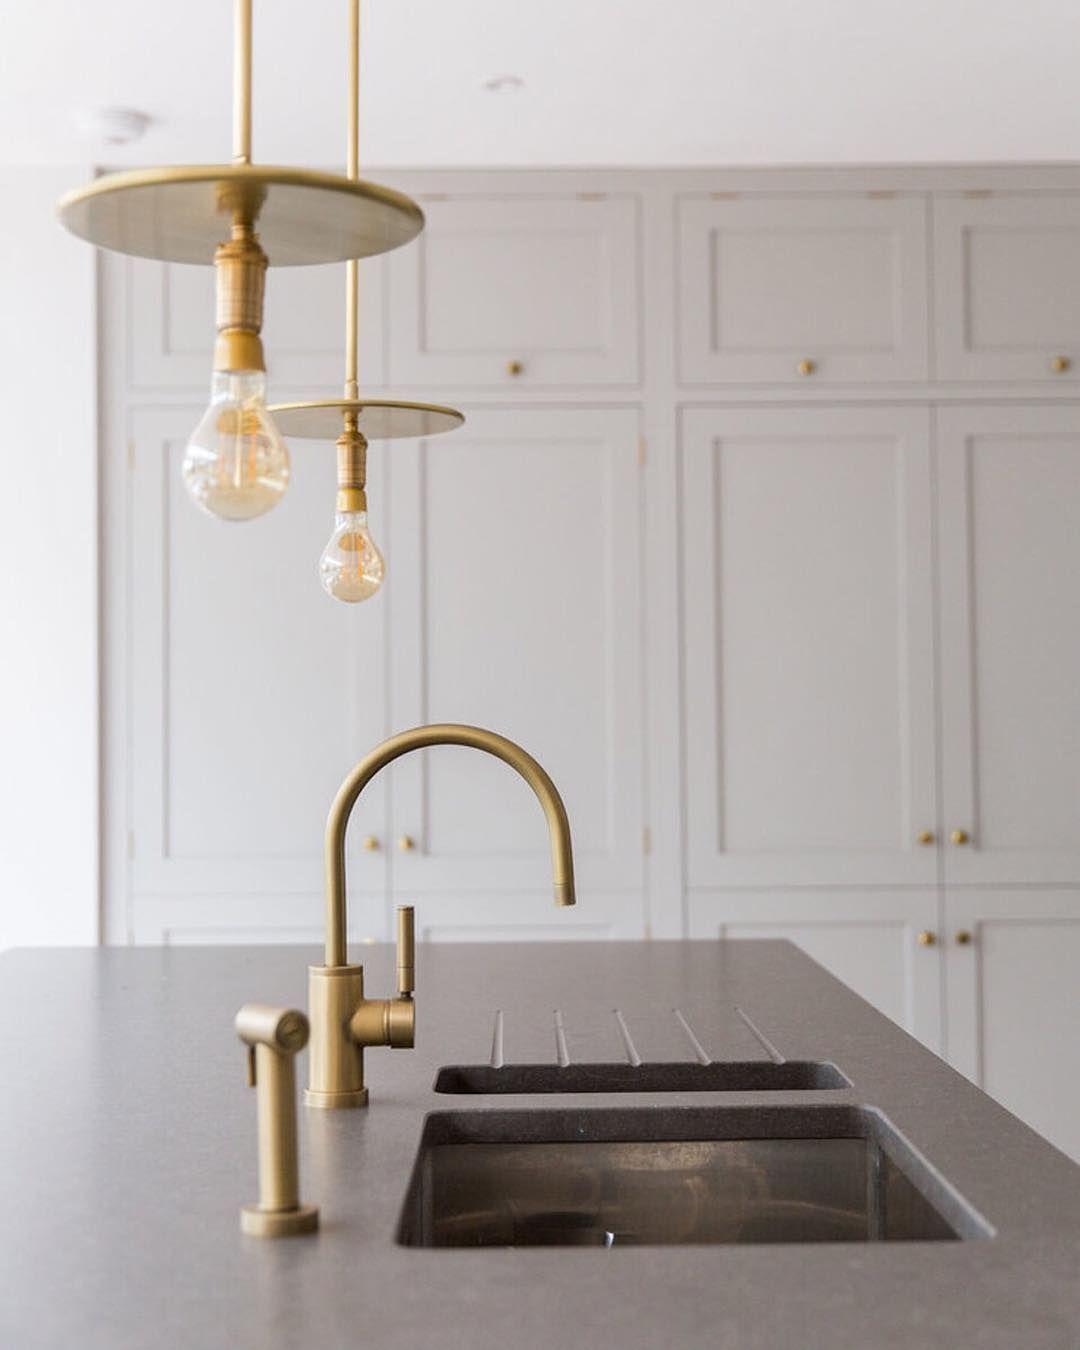 Kitchen Design Kent: Modern Country Kitchen Details. Shown Is Our Loft LOF71